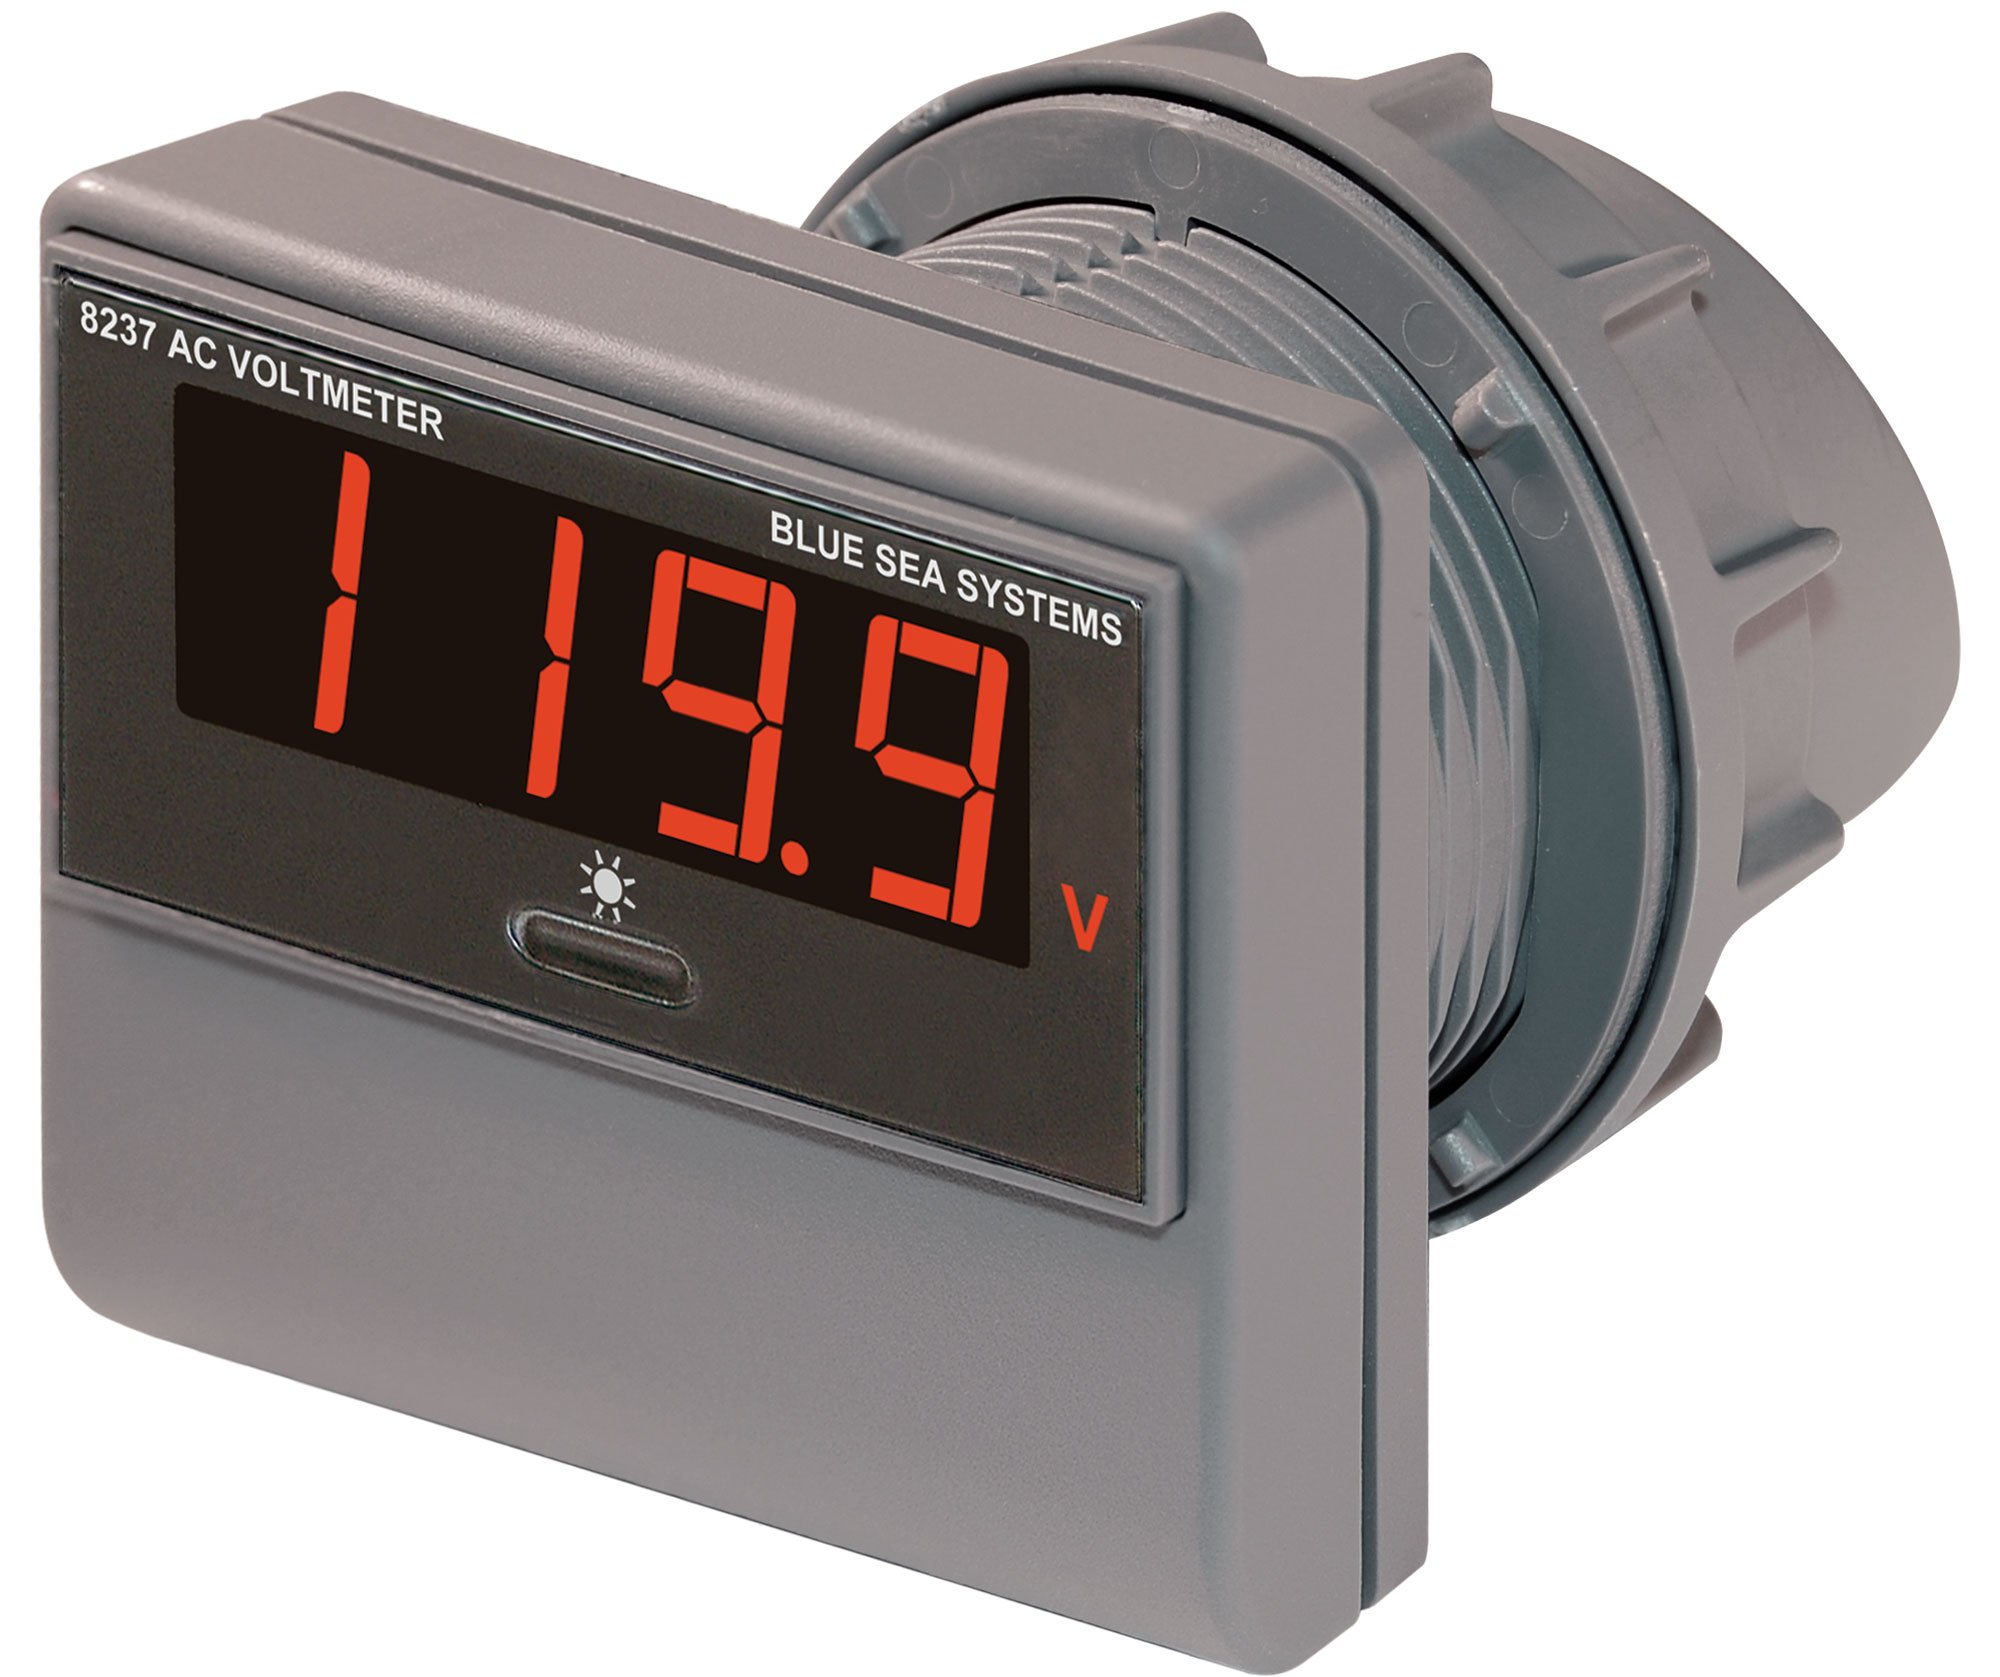 Blue Sea Systems 8237 AC Digital Voltmeter